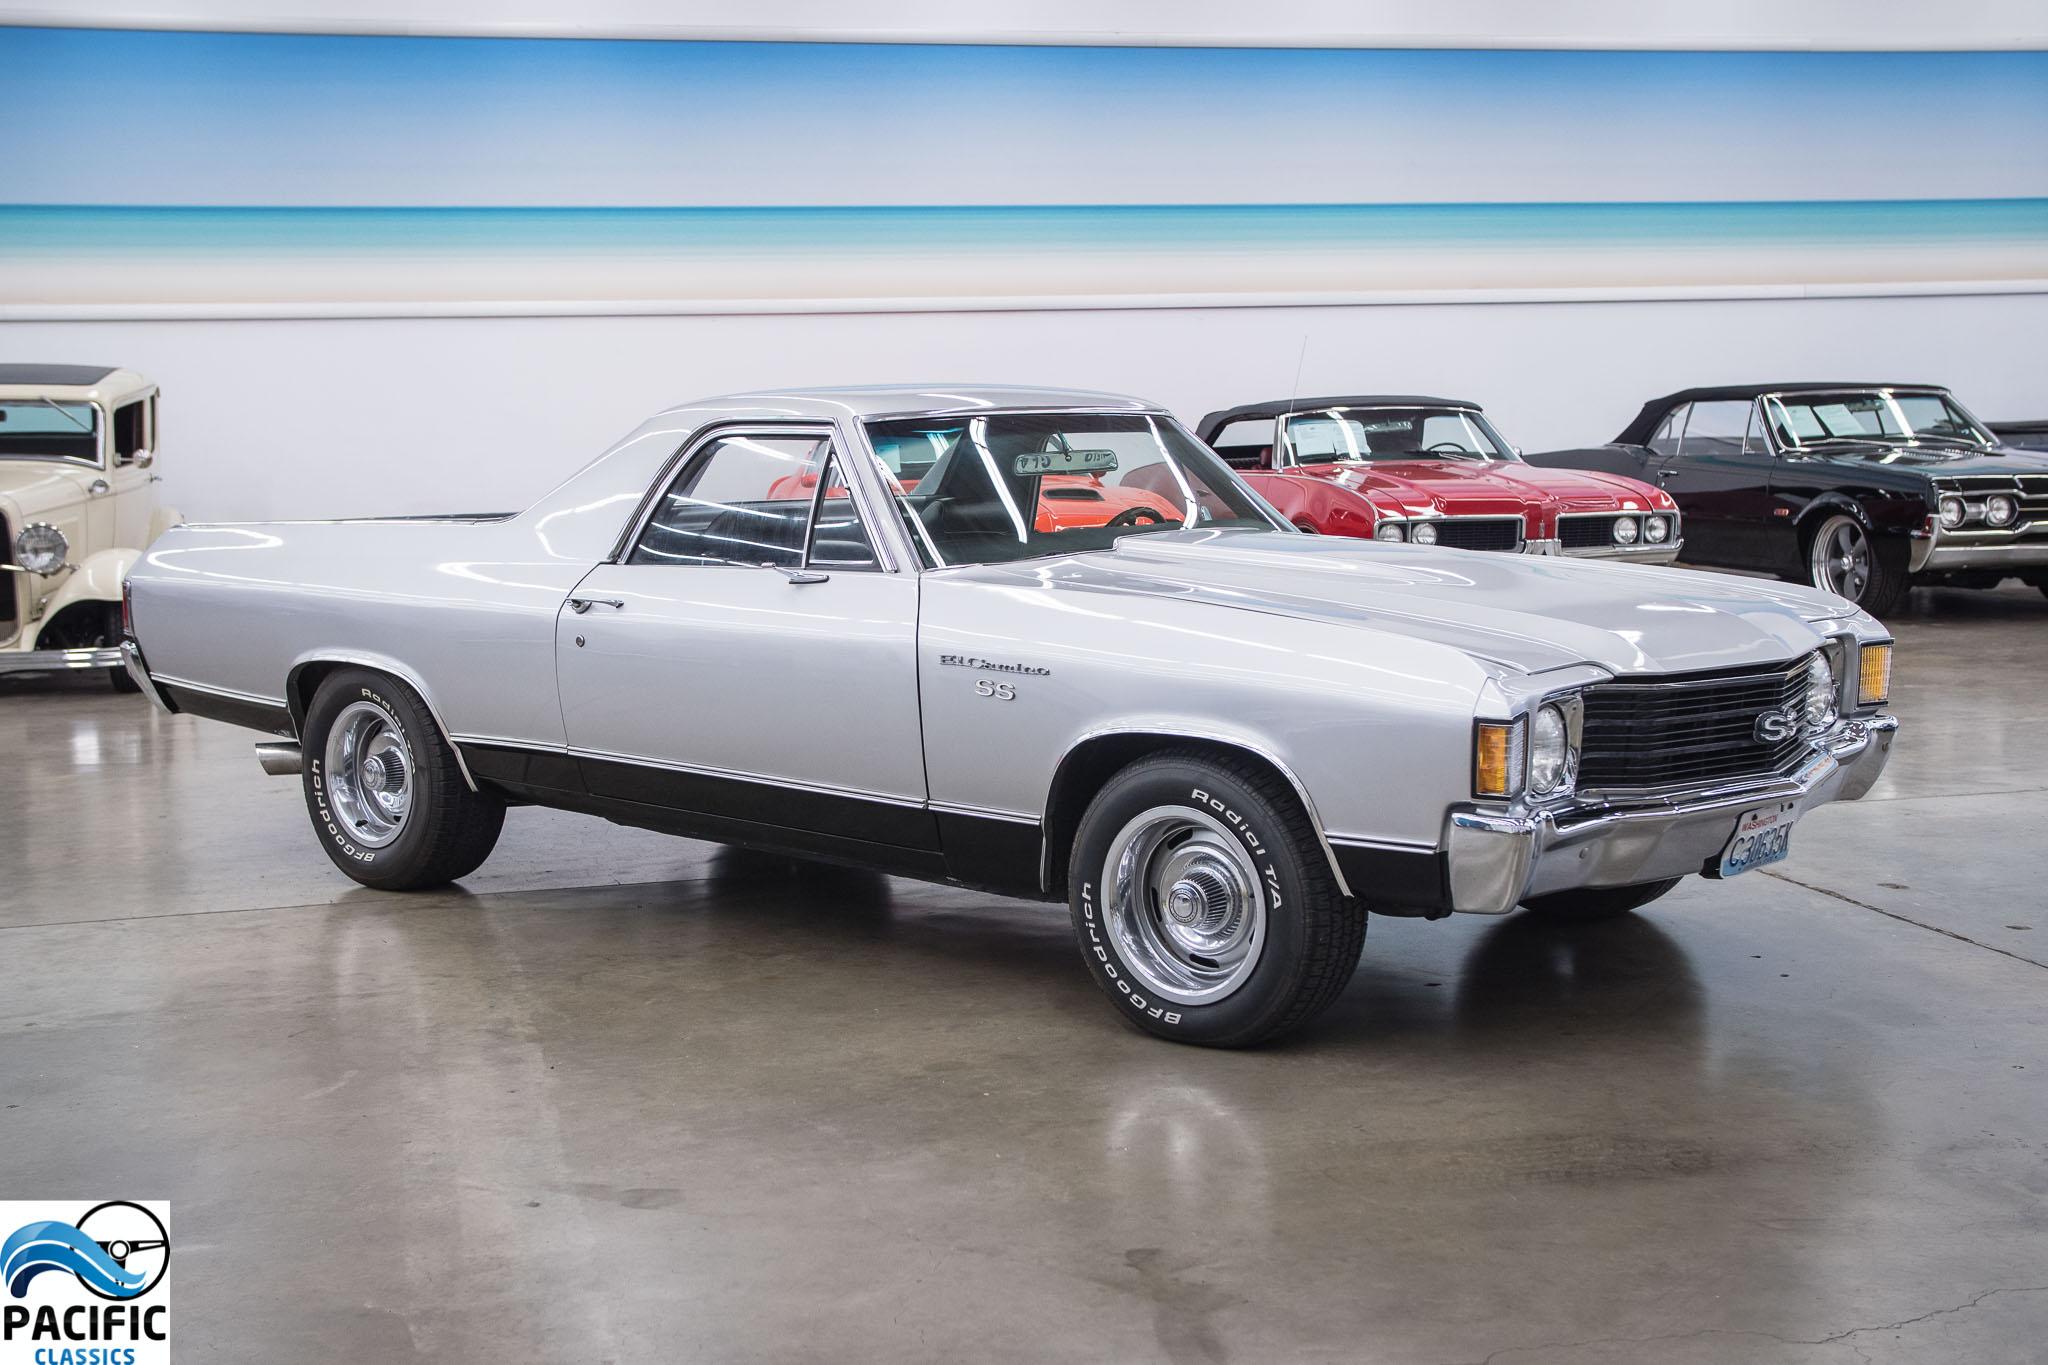 1972 Chevrolet El Camino SS Clone